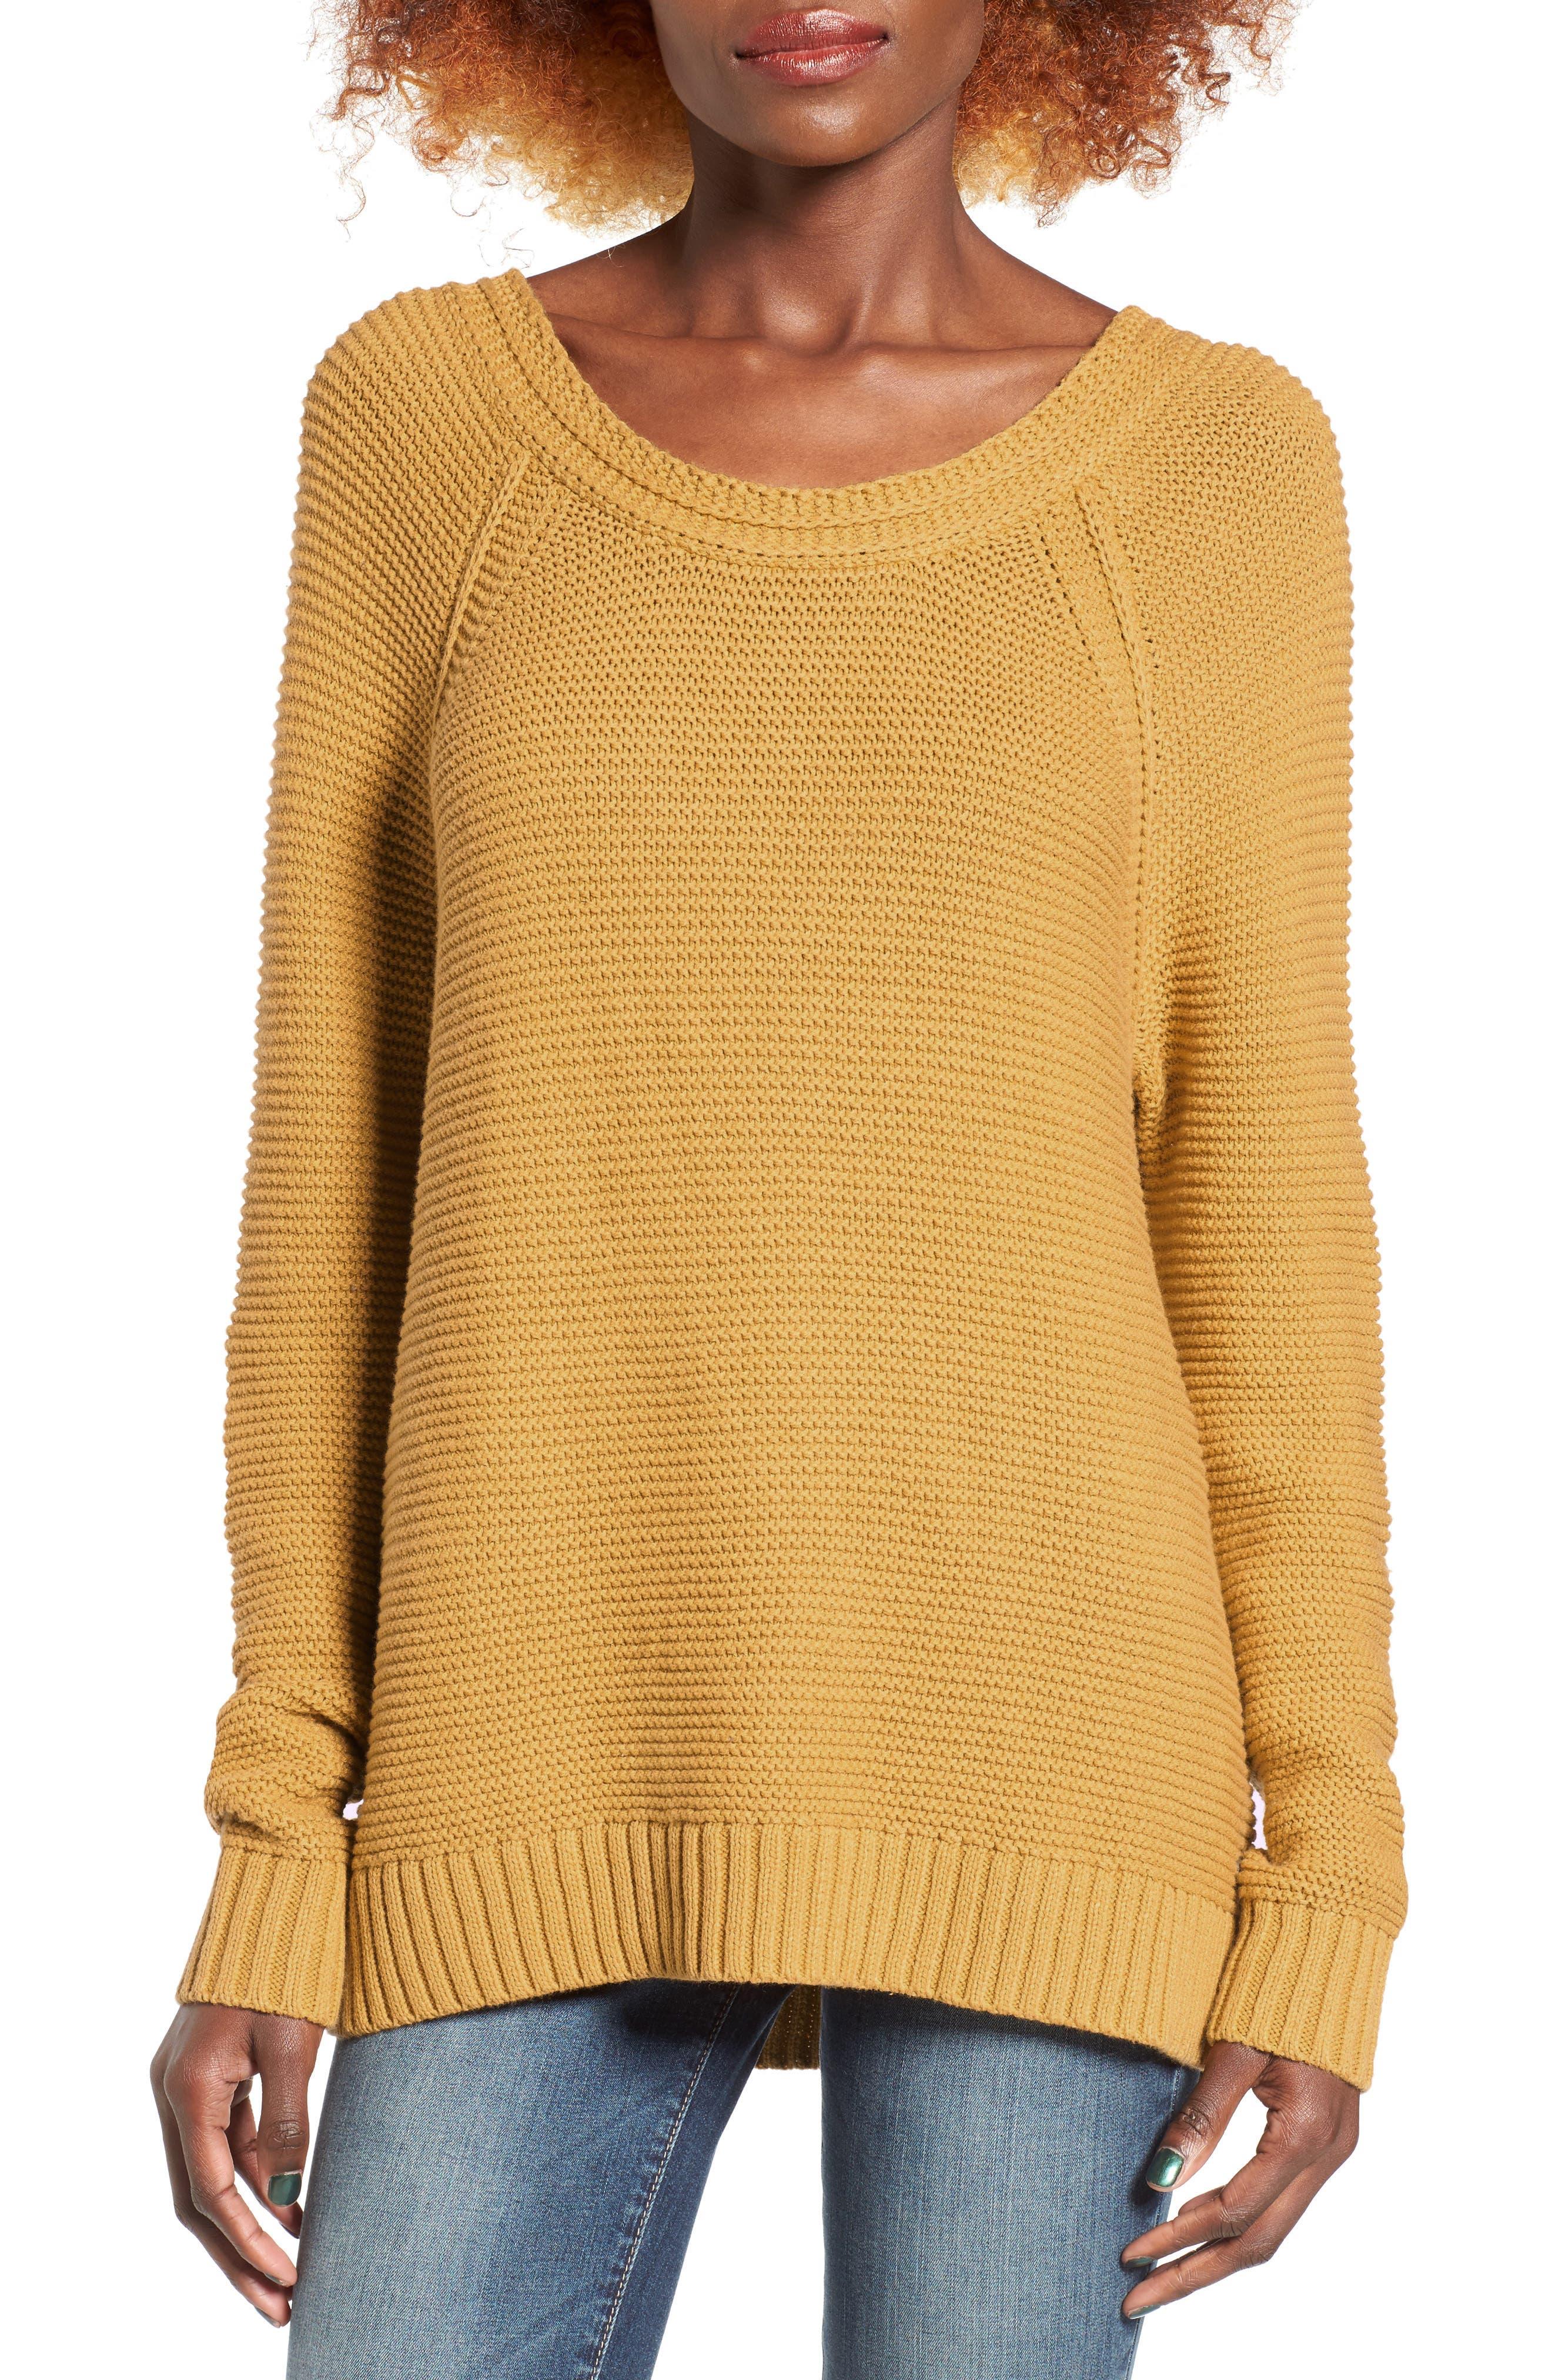 Alternate Image 1 Selected - Roxy Lost Coastlines Knit Sweater